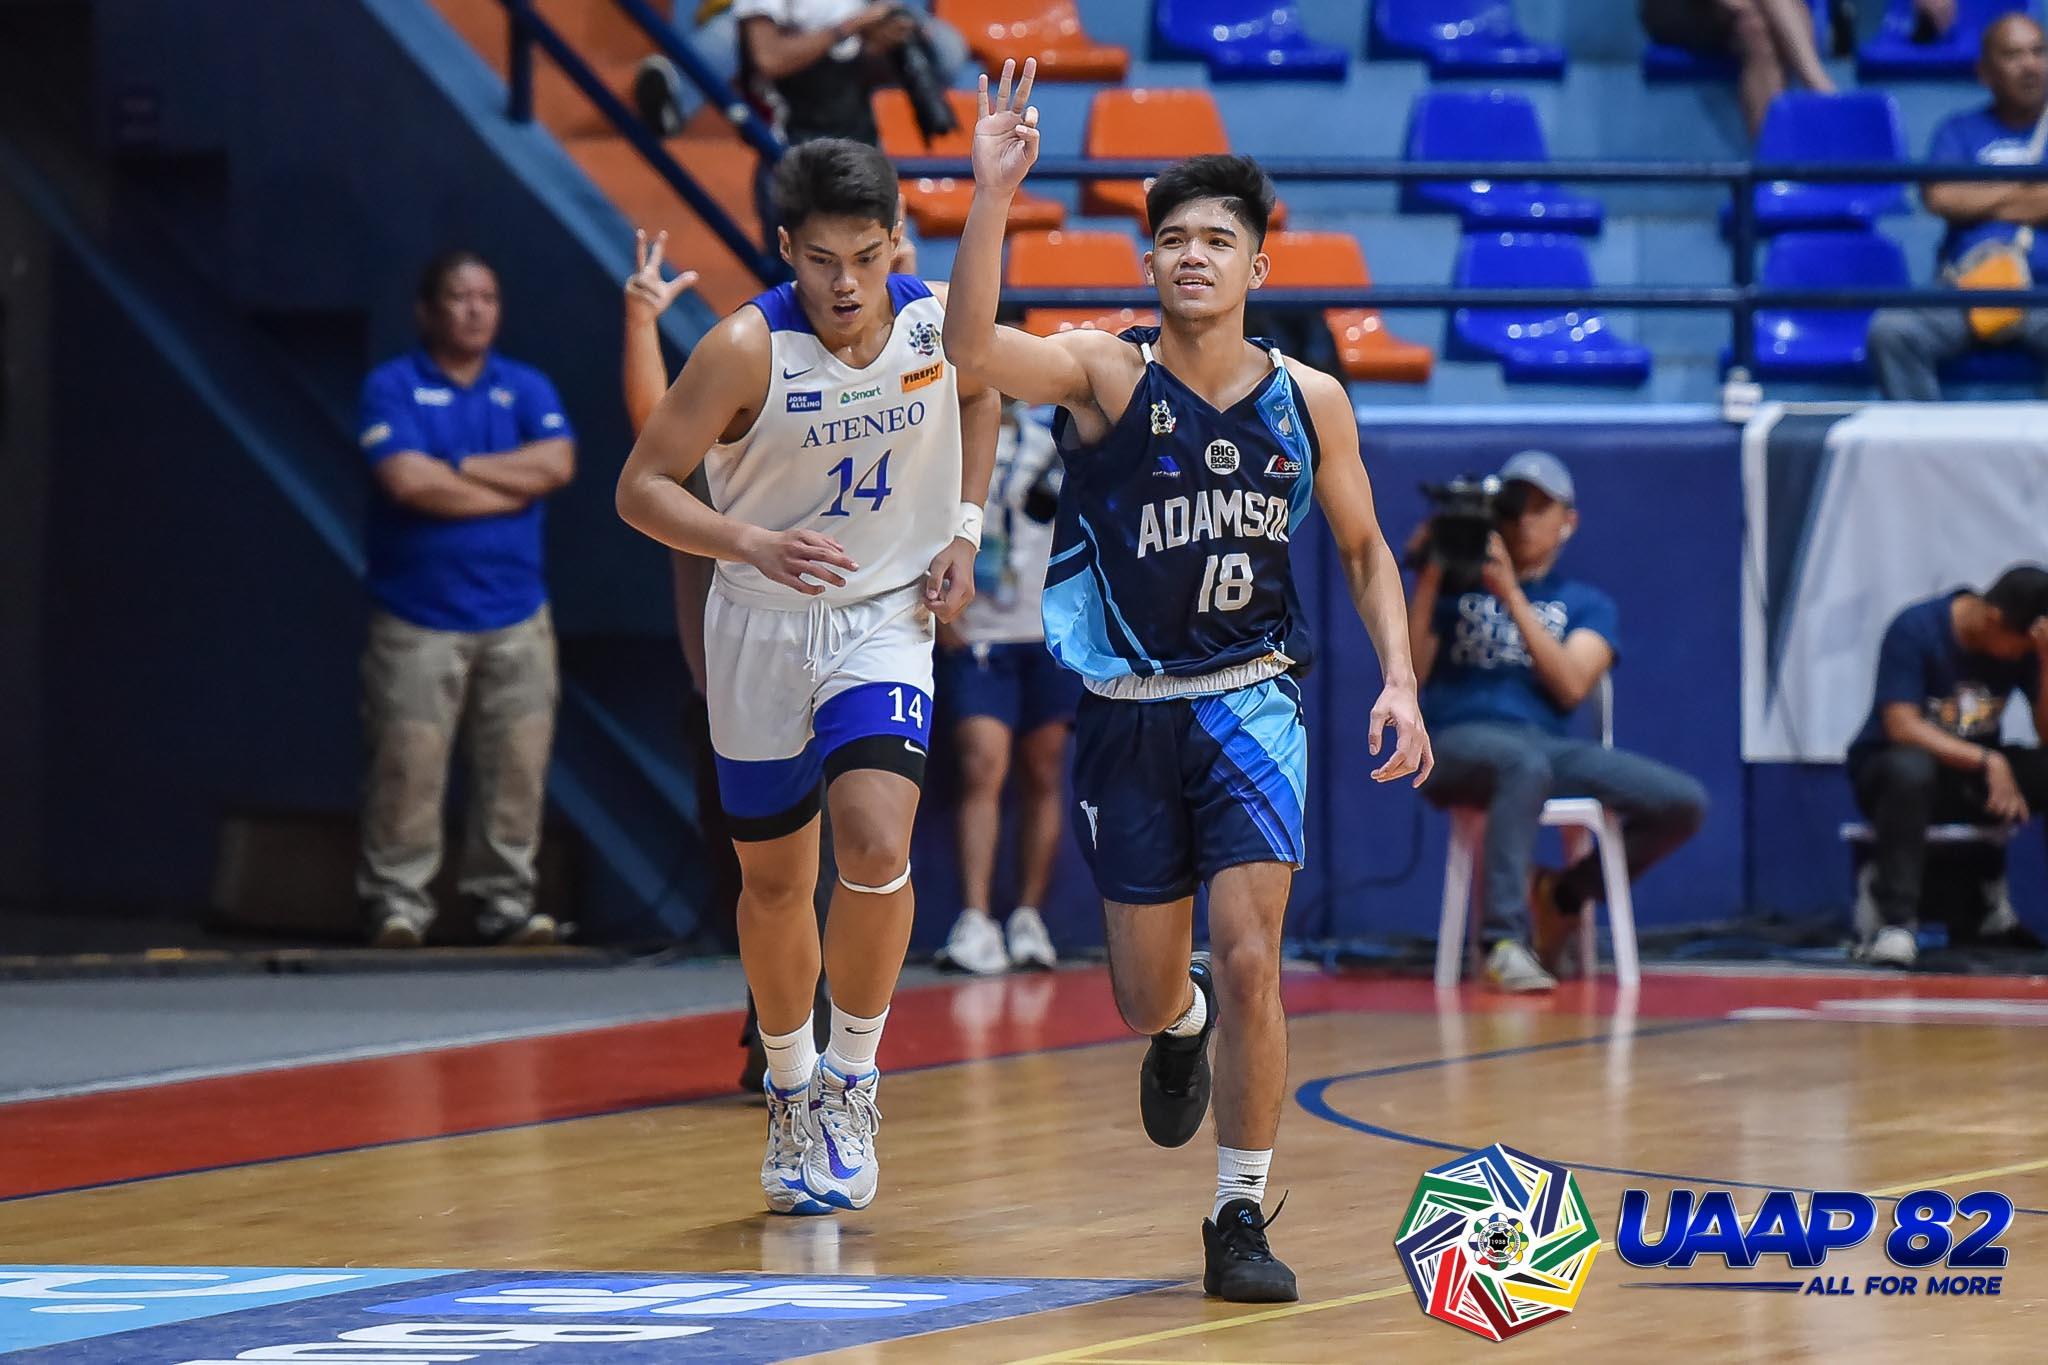 UAAP-82-Jrs-ADU-vs.-ADMU-Erolon-2751 Matty Erolon, Joshua Barcelona to remain with Adamson AdU Basketball News UAAP  - philippine sports news